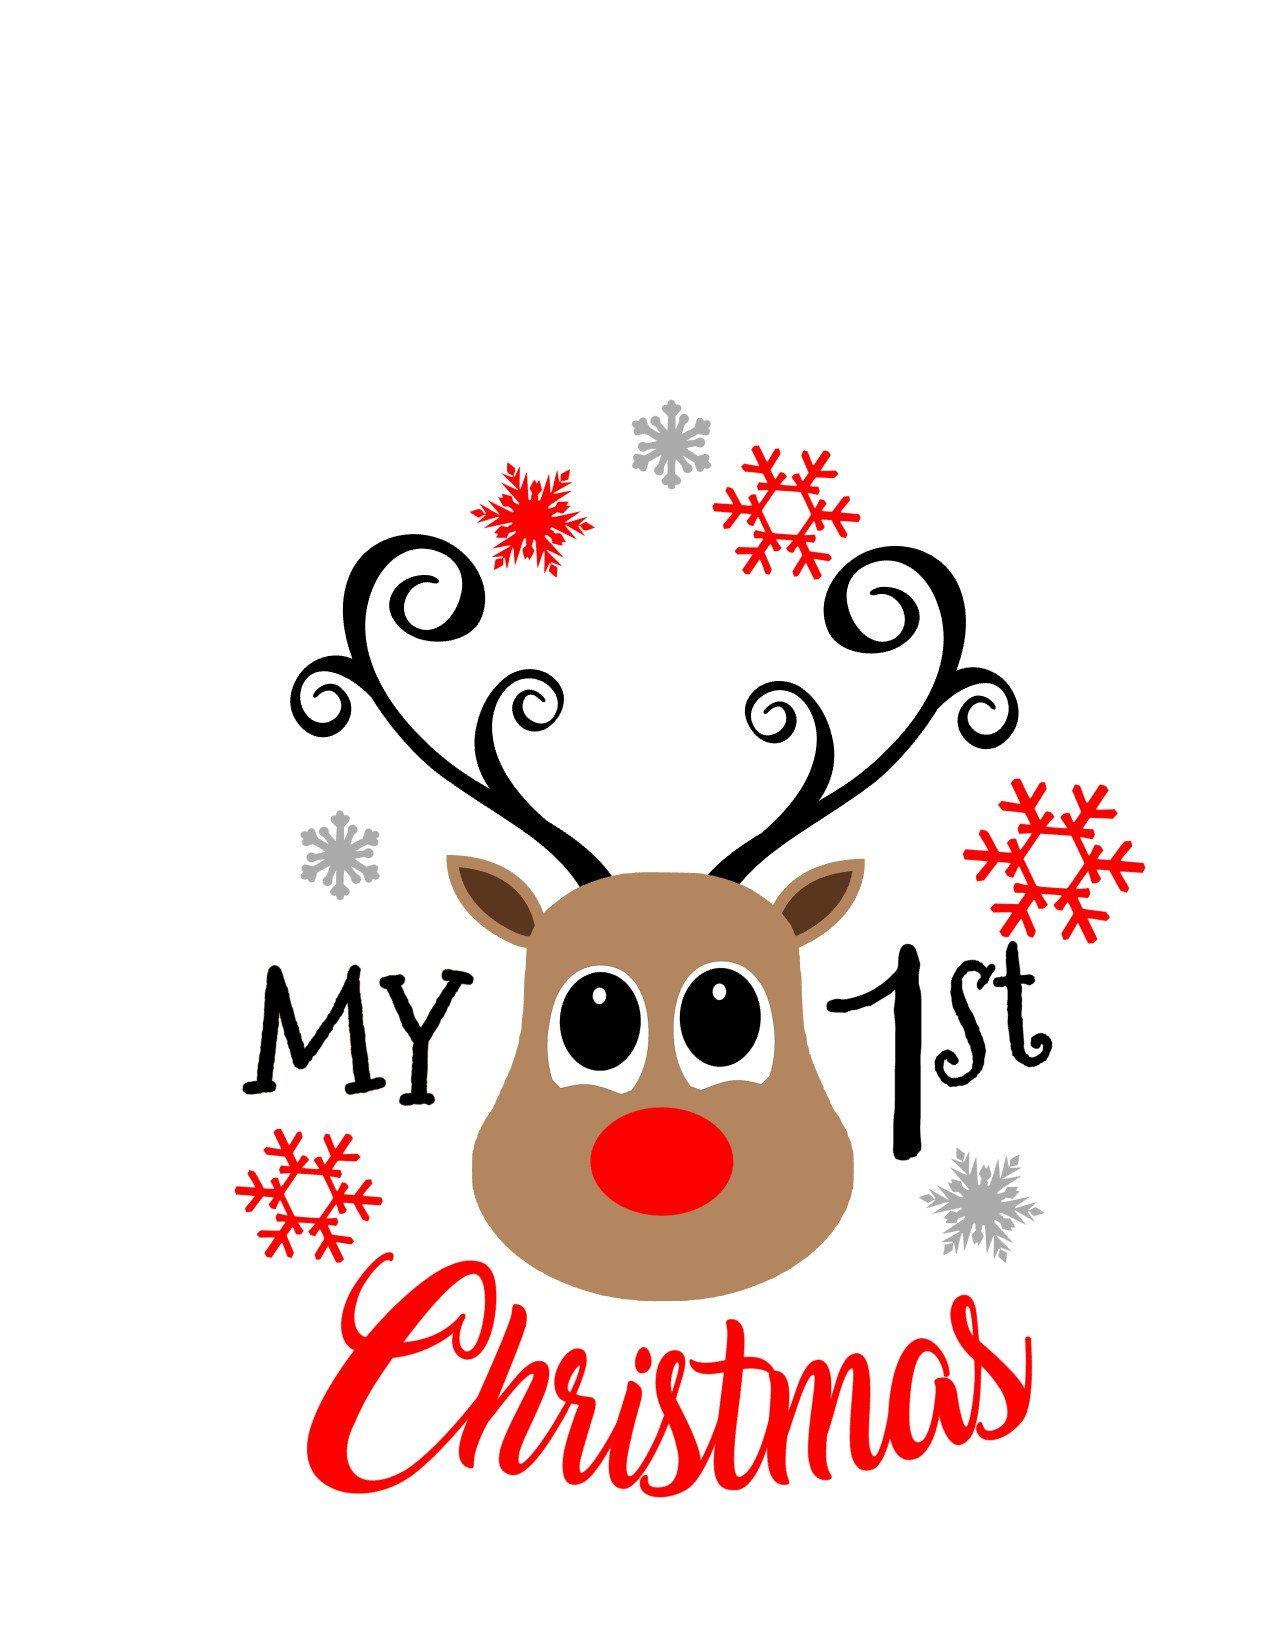 First Christmas Svg Christmas Svg Reindeer Svg Svg First Christmas Svg Christmas Svg Reind Christmas Vinyl Silhouette Cameo Christmas Cute Christmas Ideas